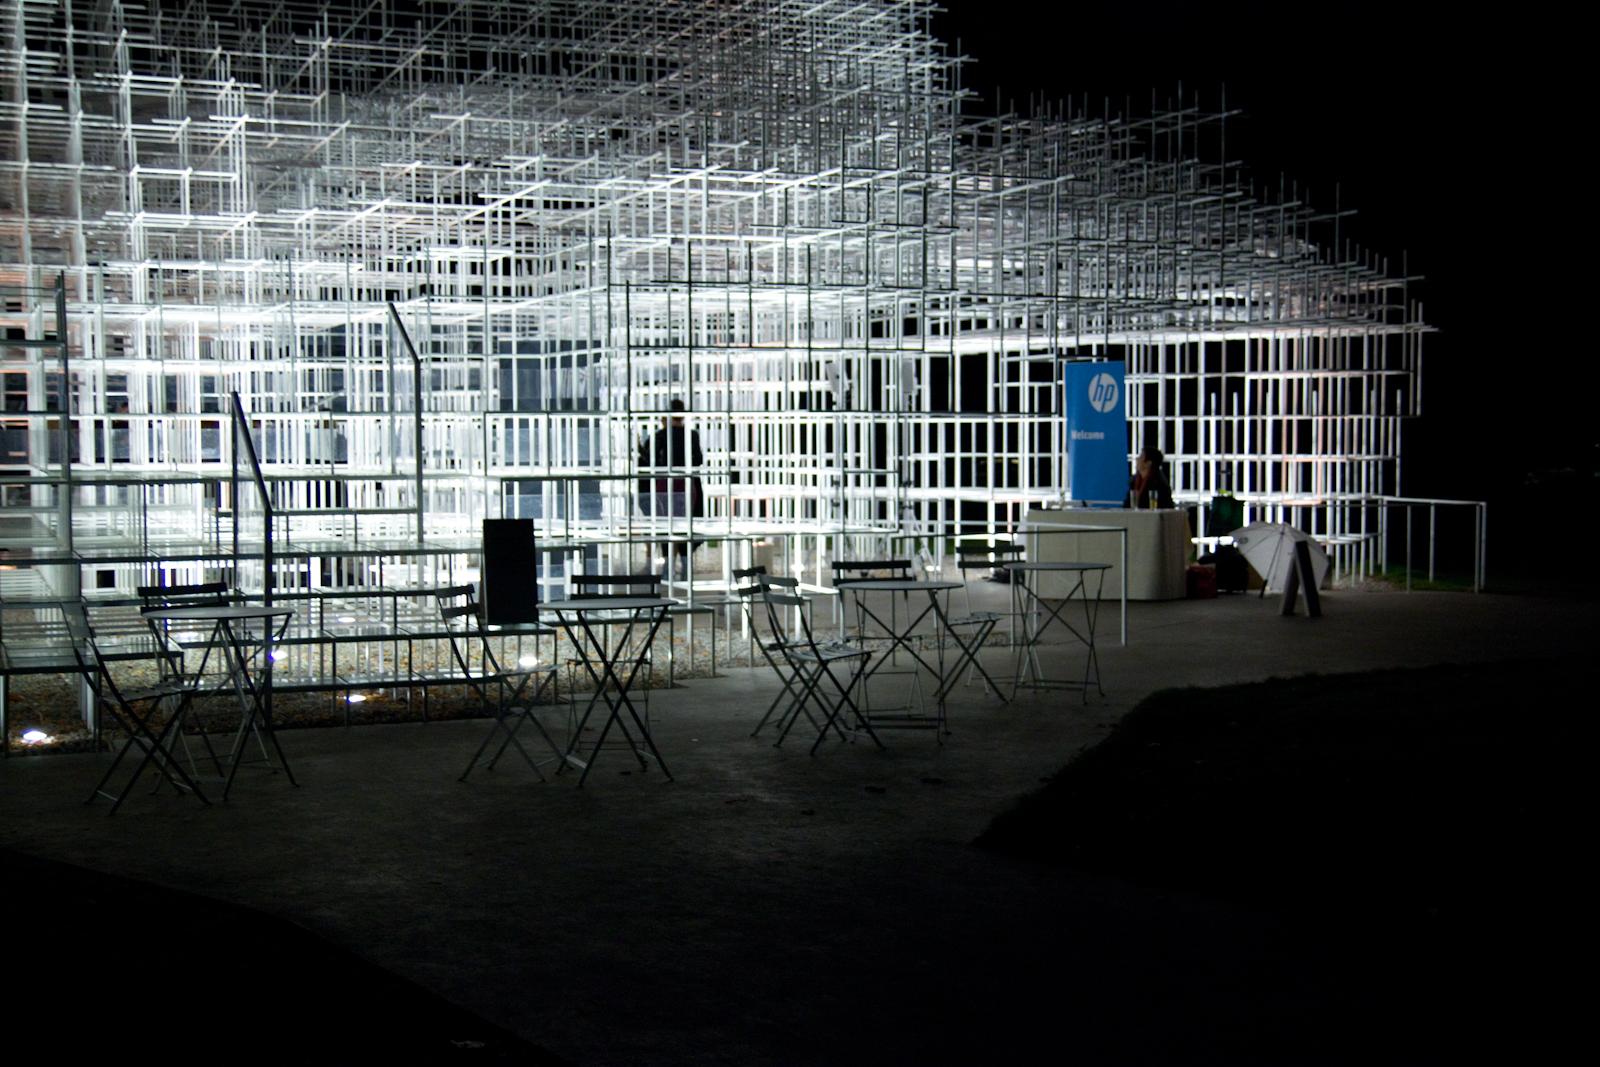 8pm - Serpentine Gallery Pavilion 2013Designed by Sou Fujimoto